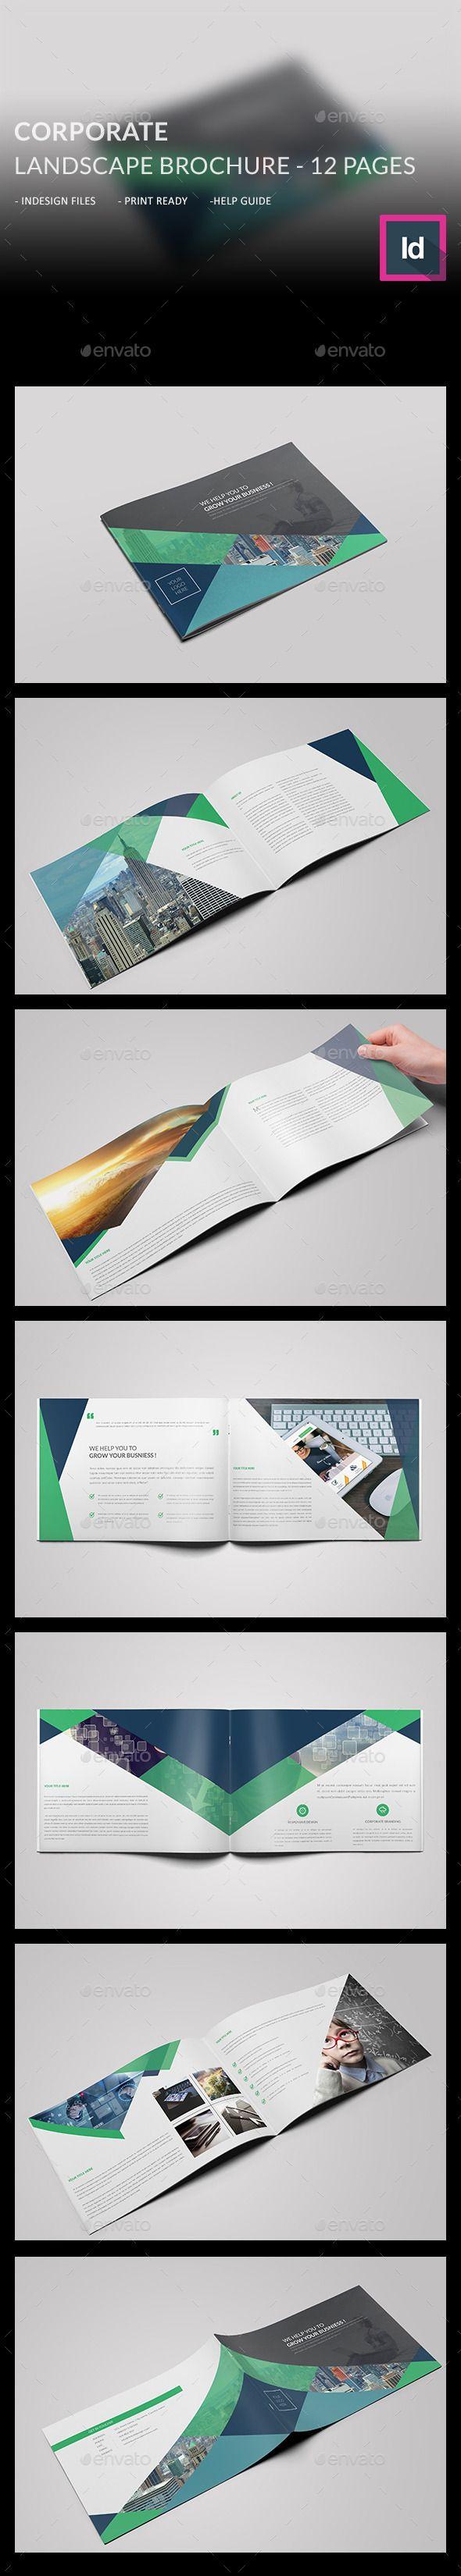 Corporate Landscape Brochure Template #design #broschüre Download: http://graphicriver.net/item/corporate-landscape-brochure-/12499337?ref=ksioks